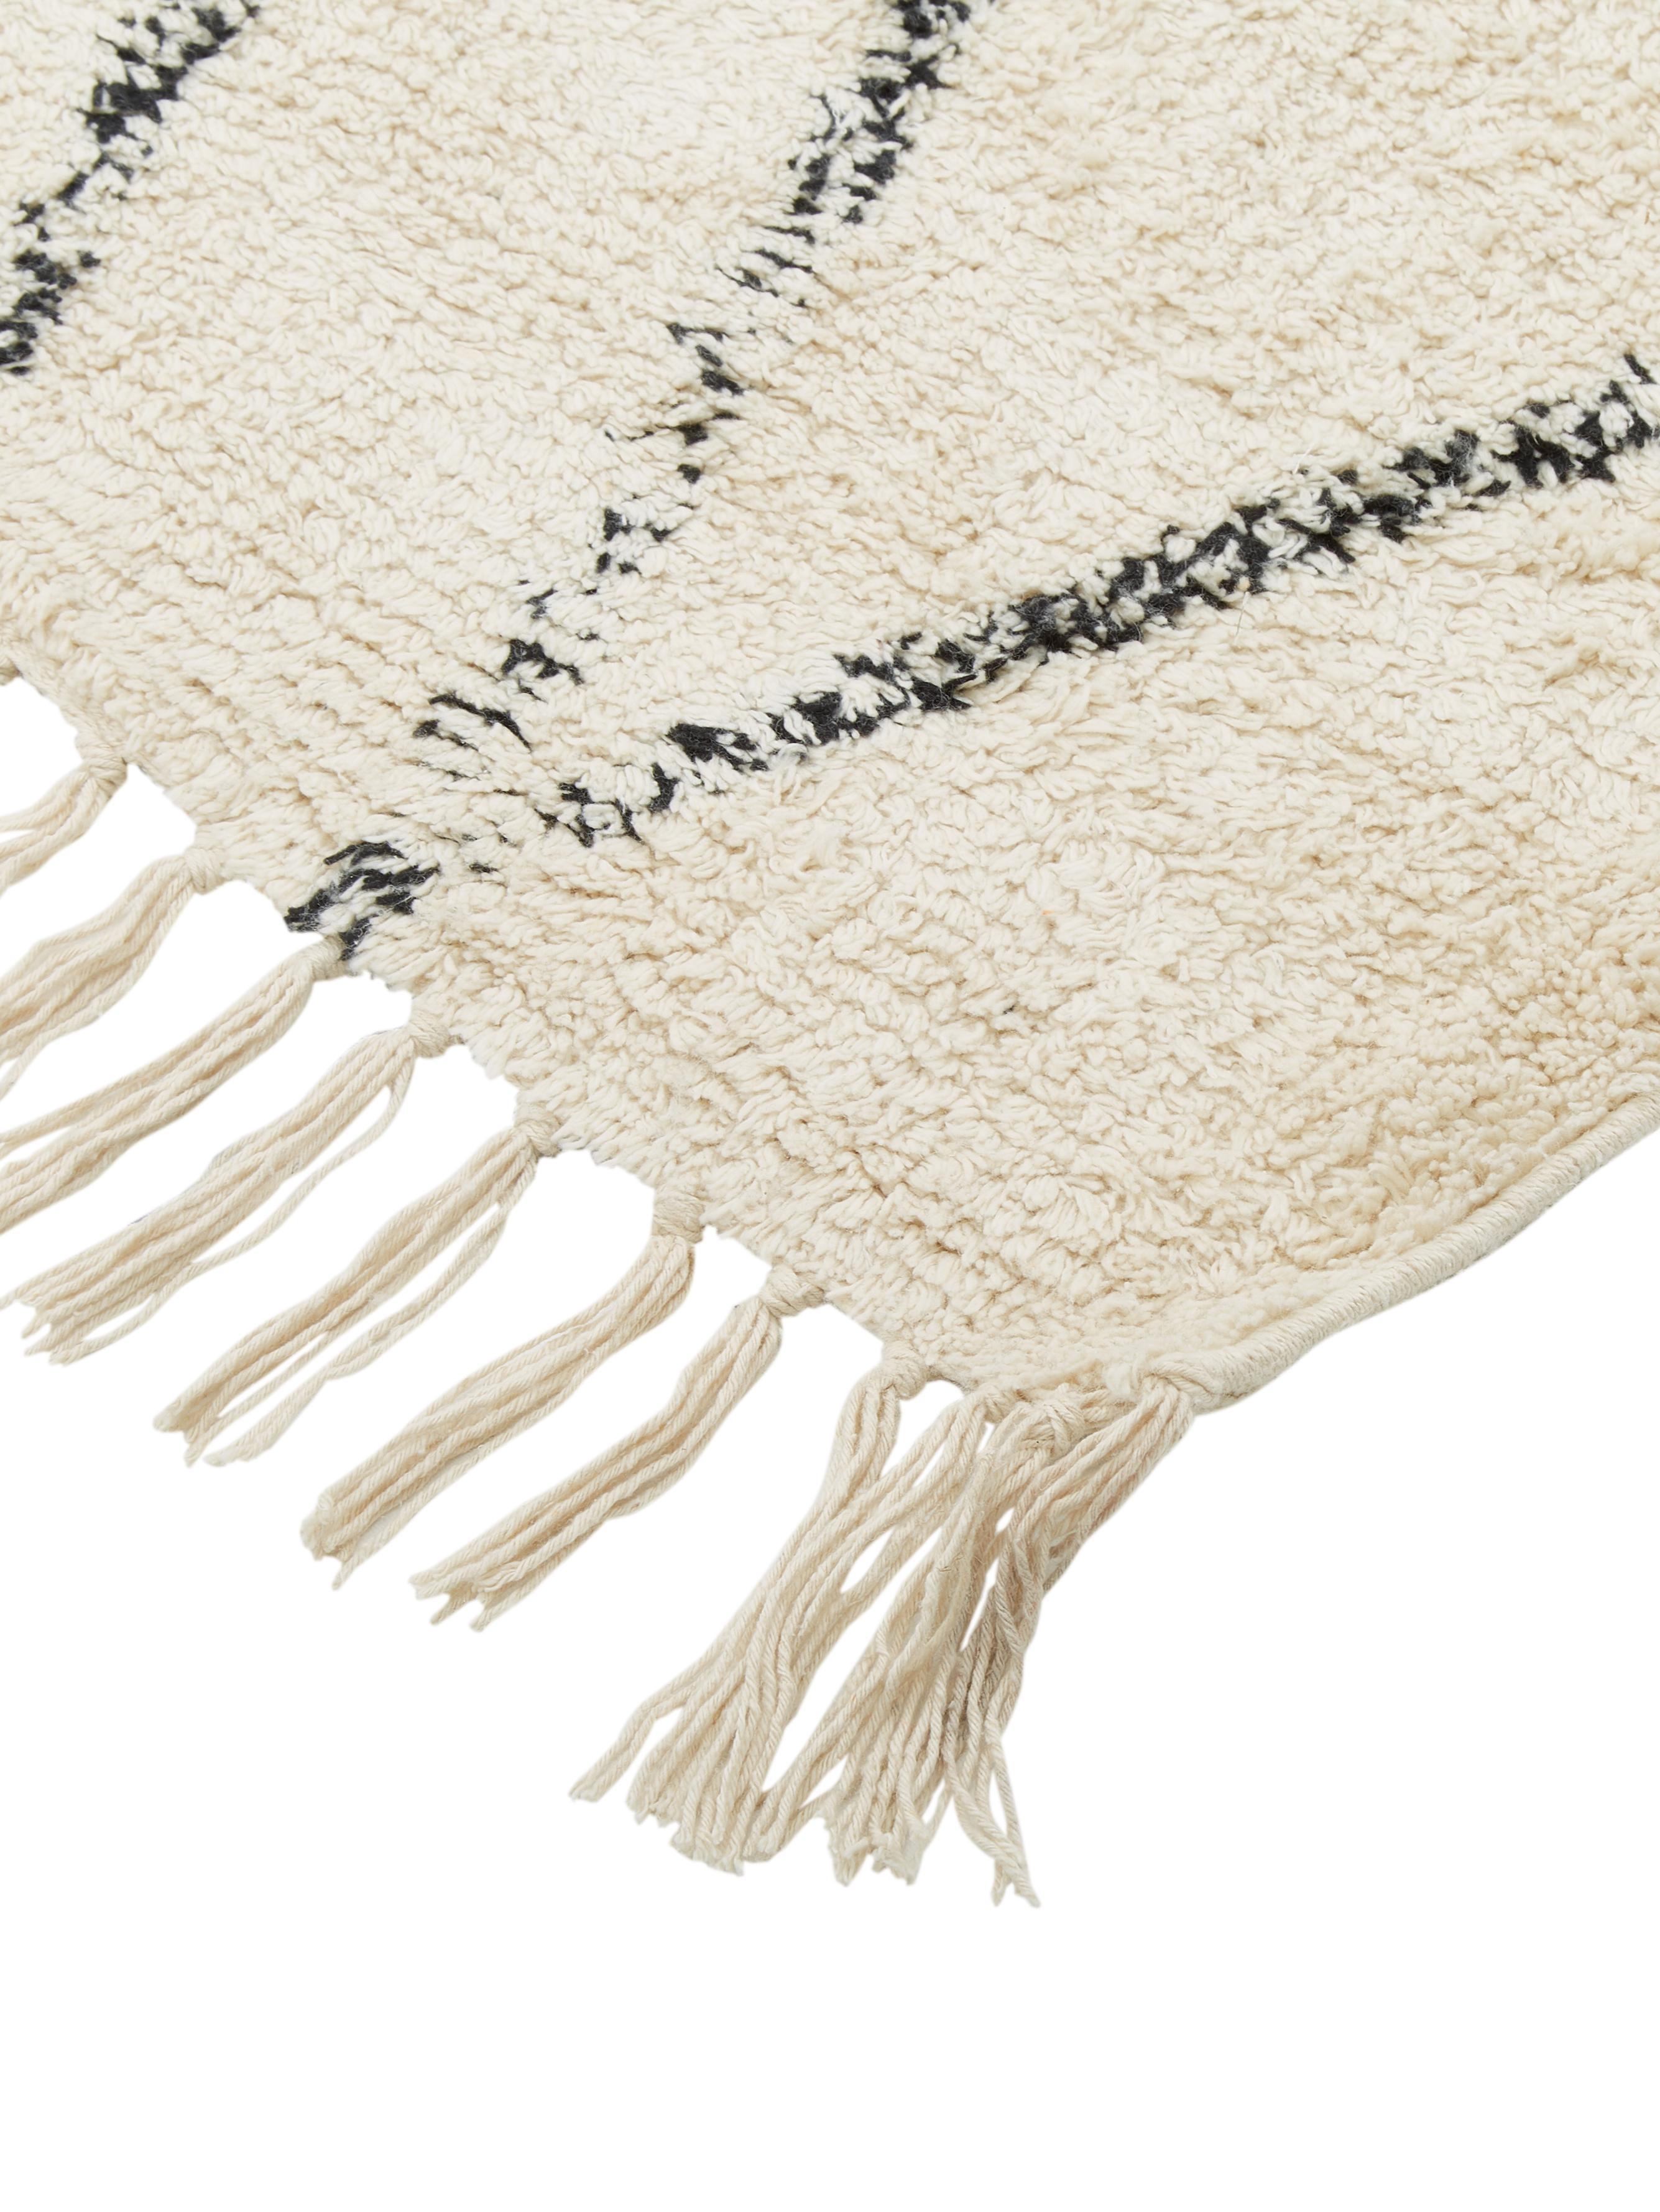 Alfombra artesanal de algodón Bina, Beige, negro, An 200 x L 300 cm (Tamaño L)